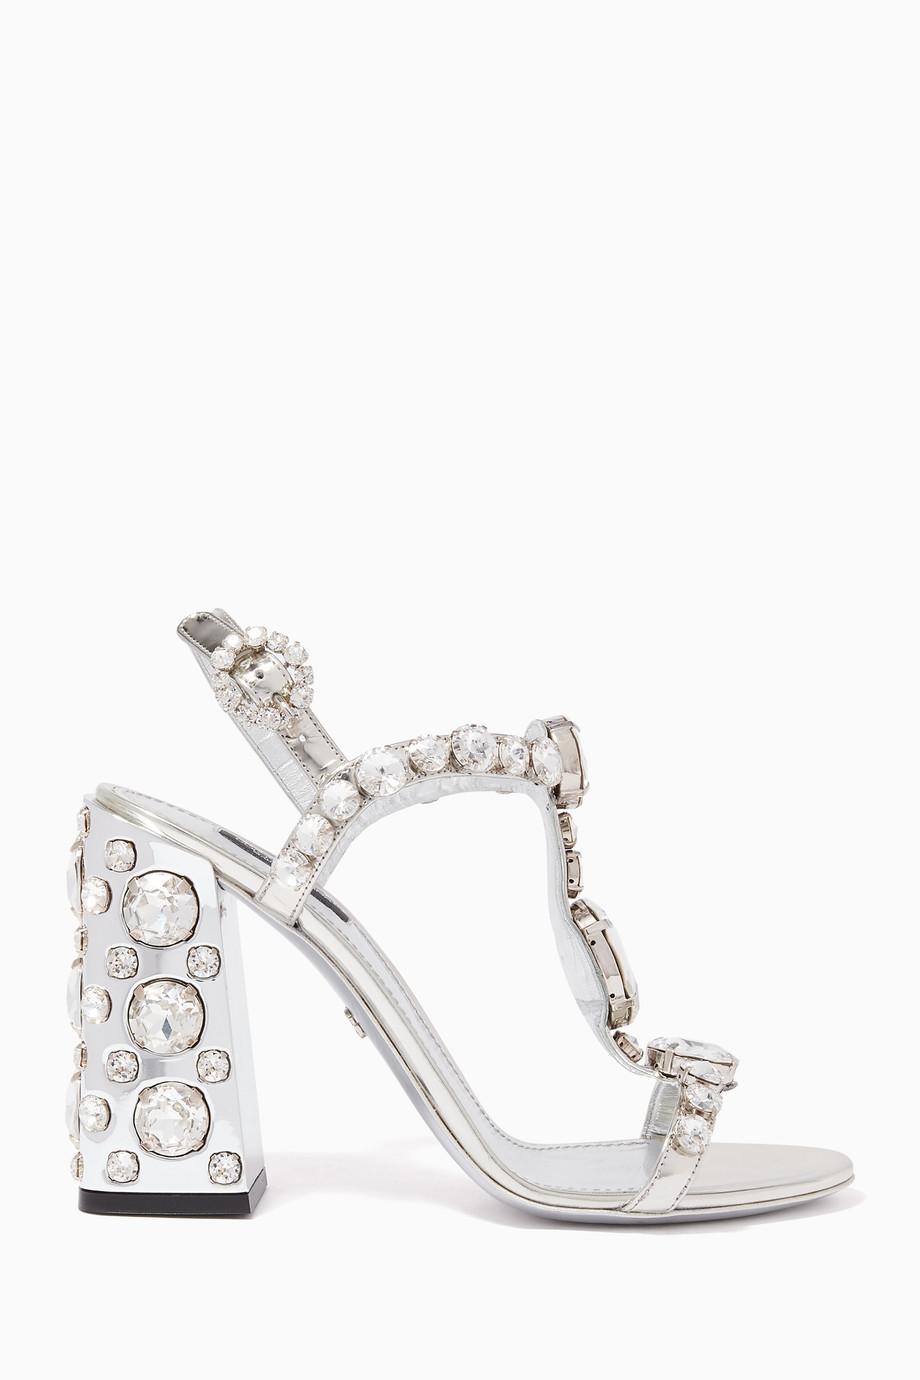 3d9be16fa Shop Dolce & Gabbana Silver Keira Crystal-Embellished Sandals for ...